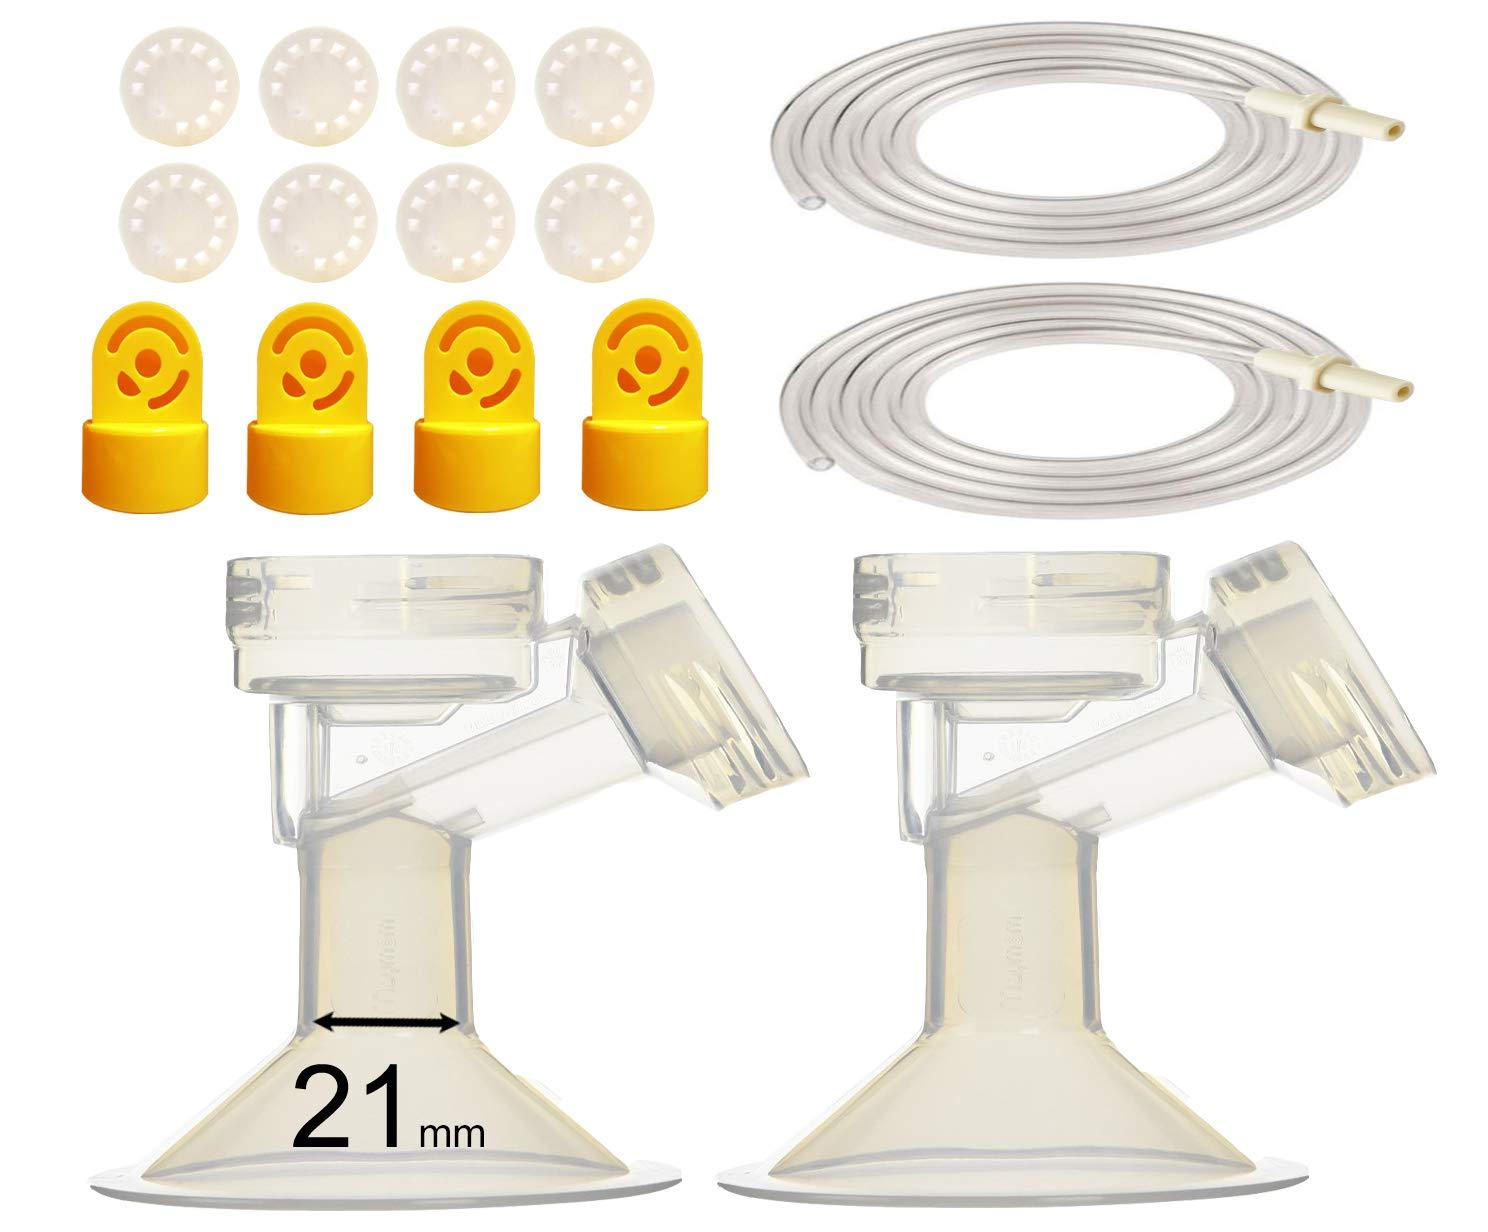 Pump Tubing and Breast Pump Kit for Medela Pump 24 mm Standard